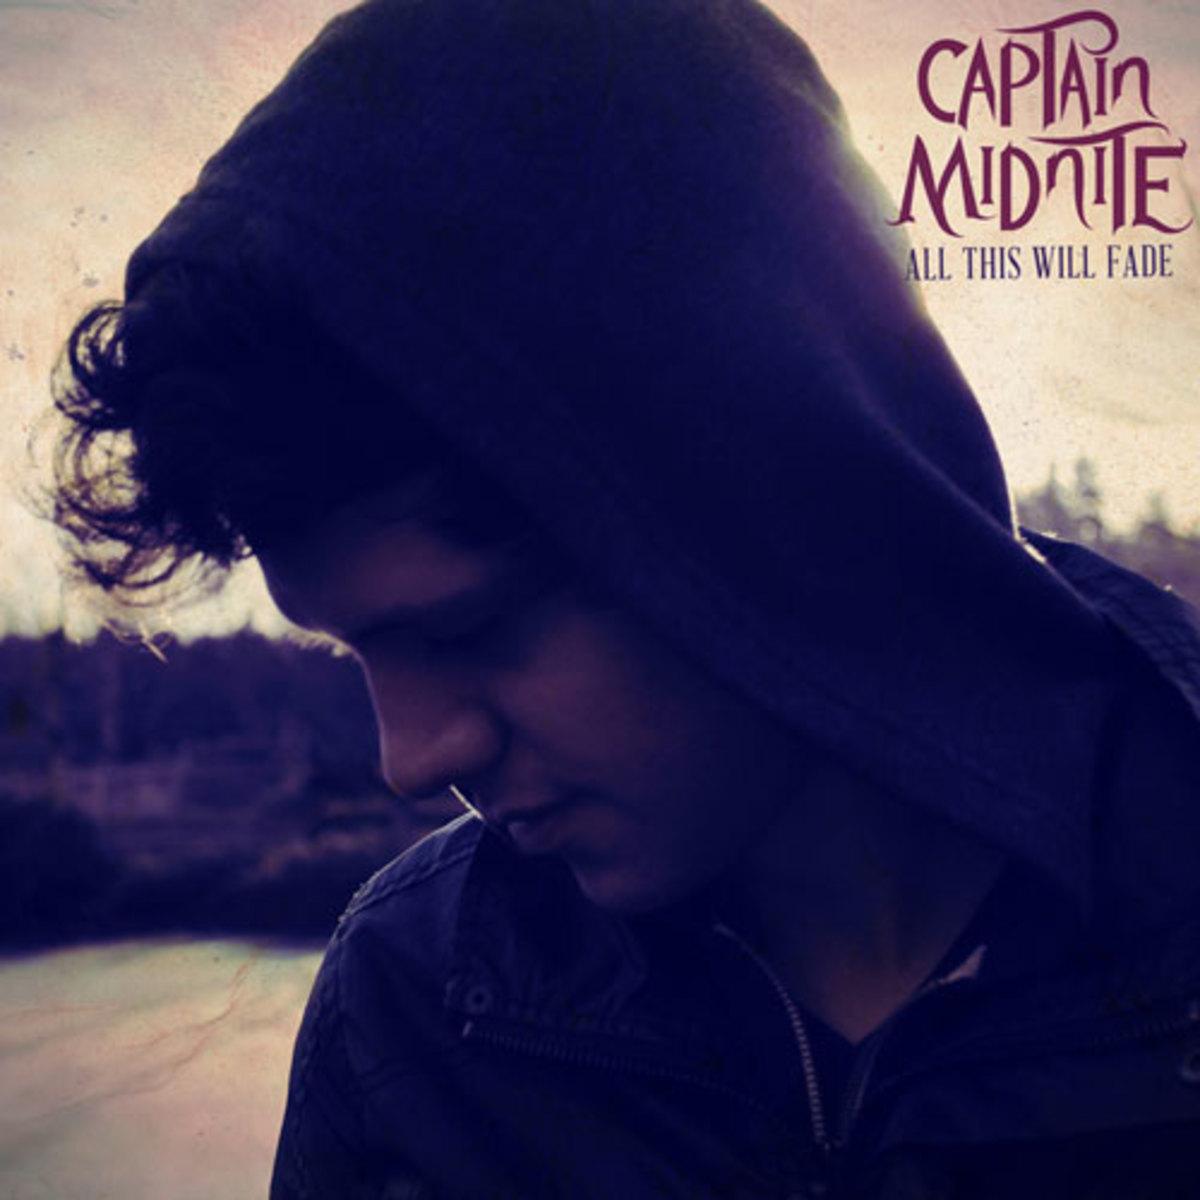 captainmidnite-allfade.jpg